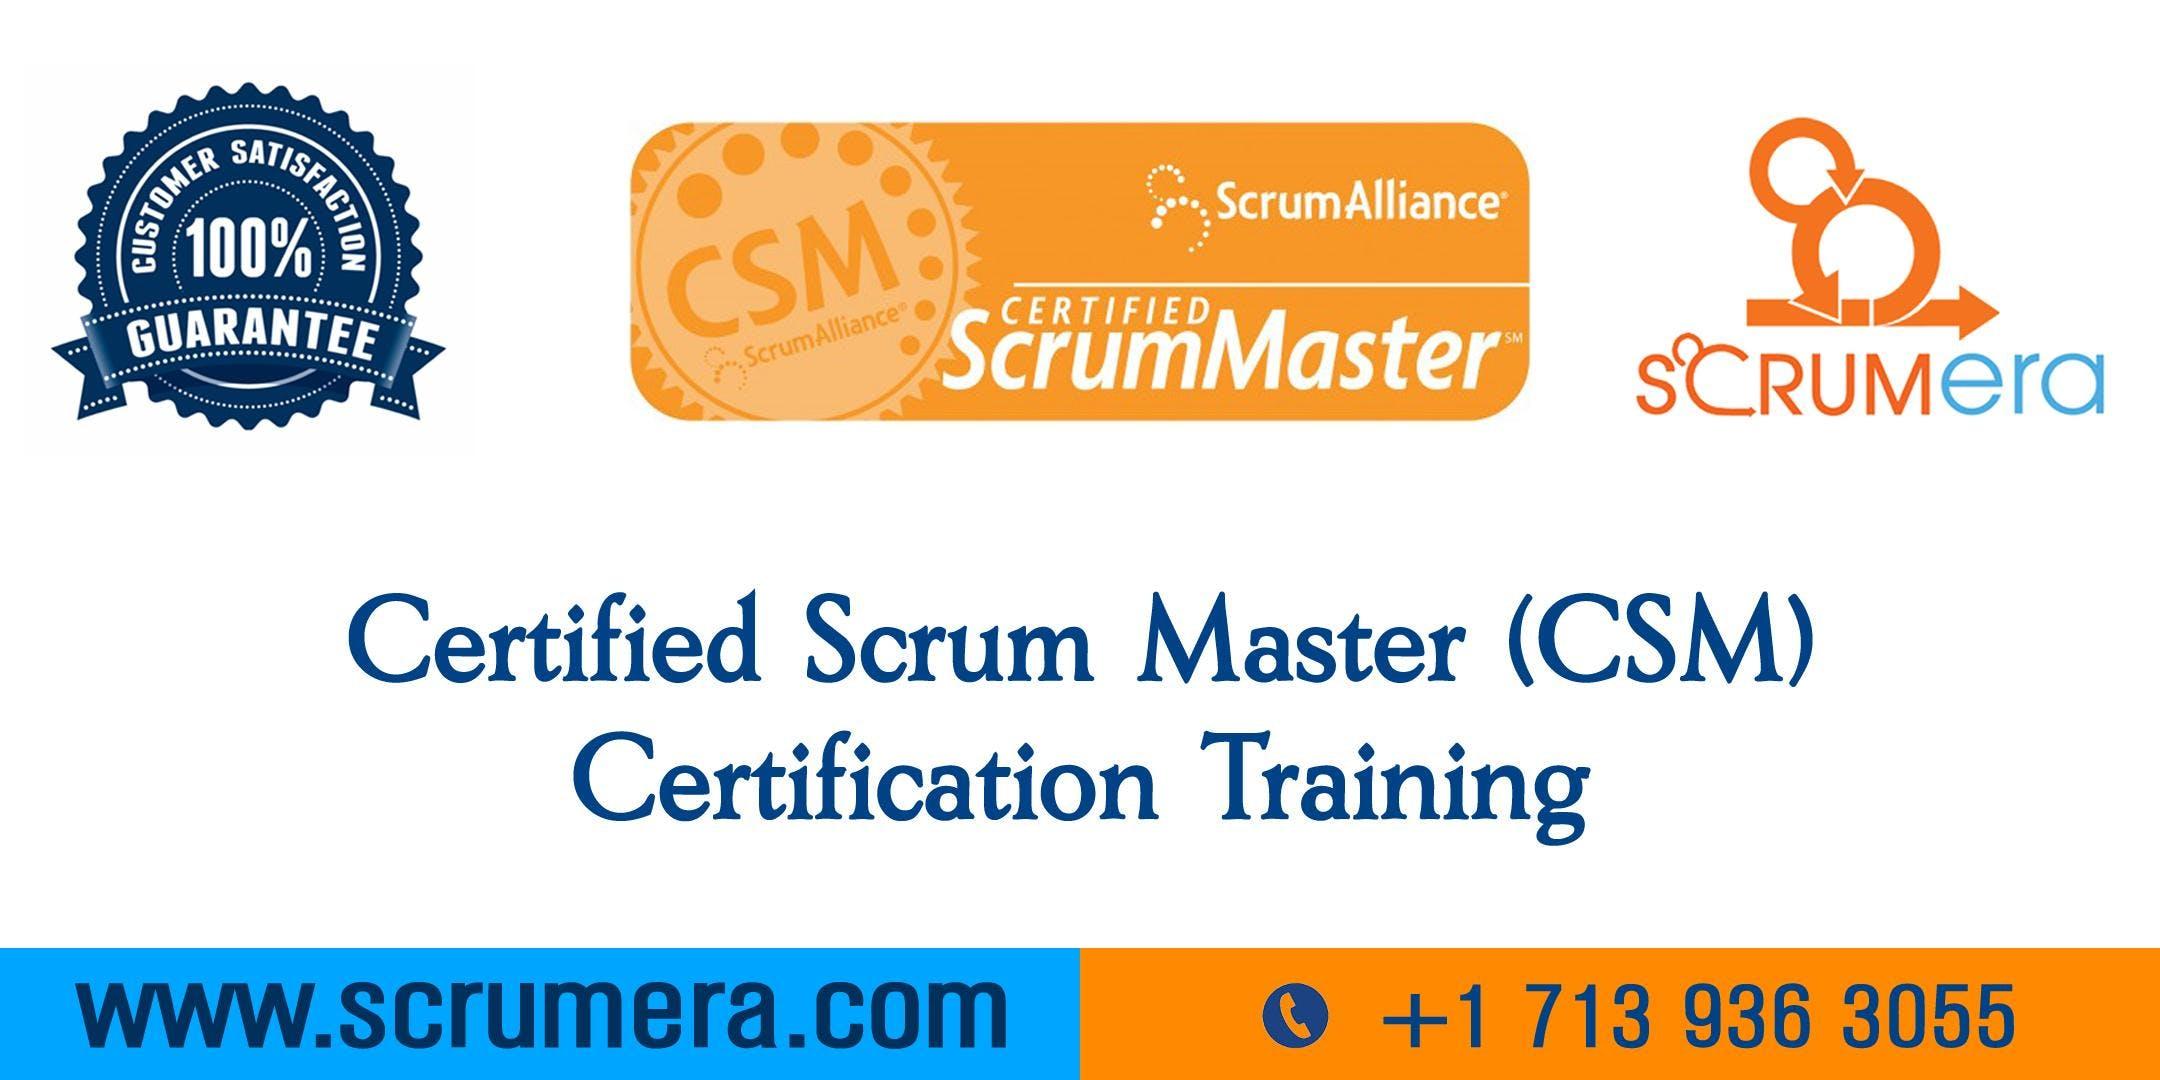 Scrum Master Certification | CSM Training | CSM Certification Workshop | Certified Scrum Master (CSM) Training in Los Angeles, CA | ScrumERA